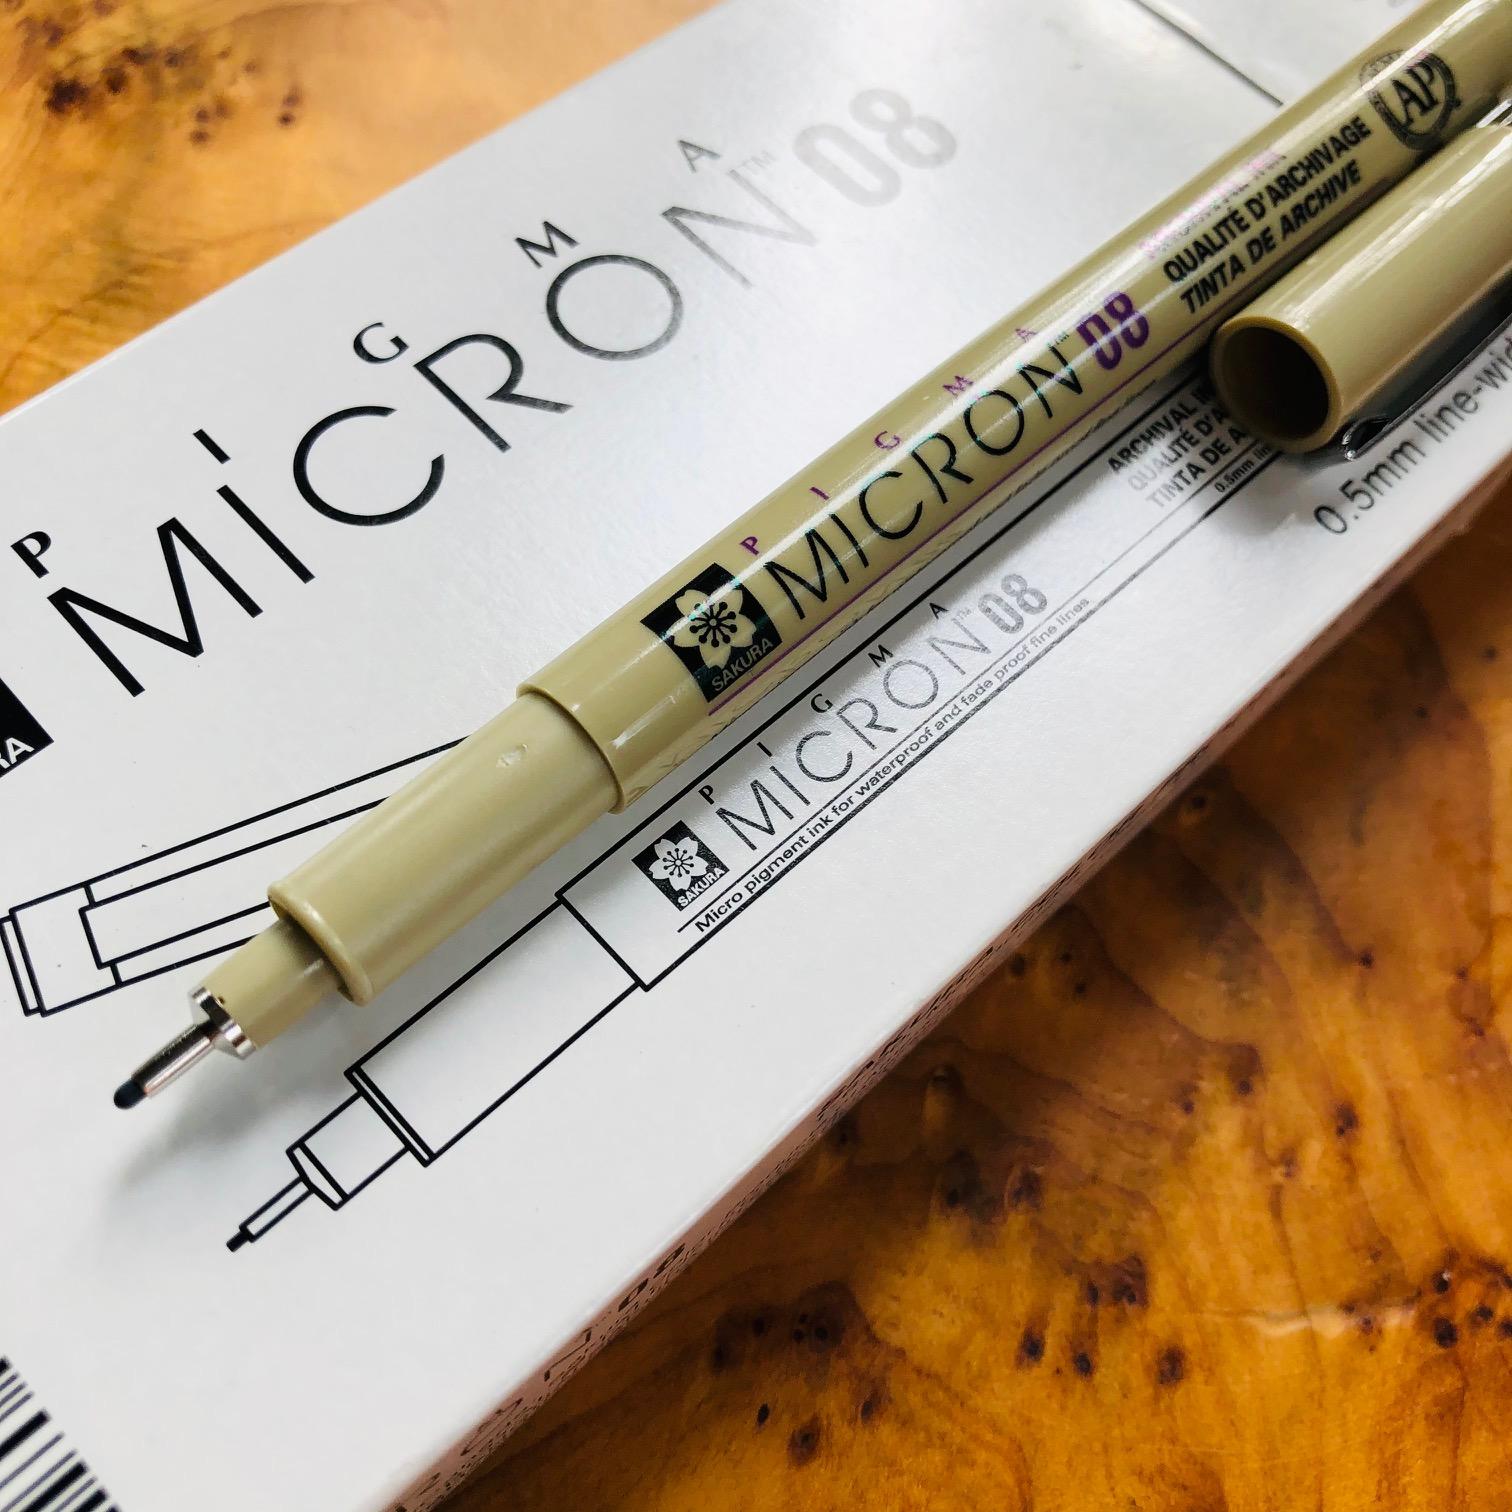 Sakura Pigma Micron Permanent Pen BLACK  Marker .5mm Fine